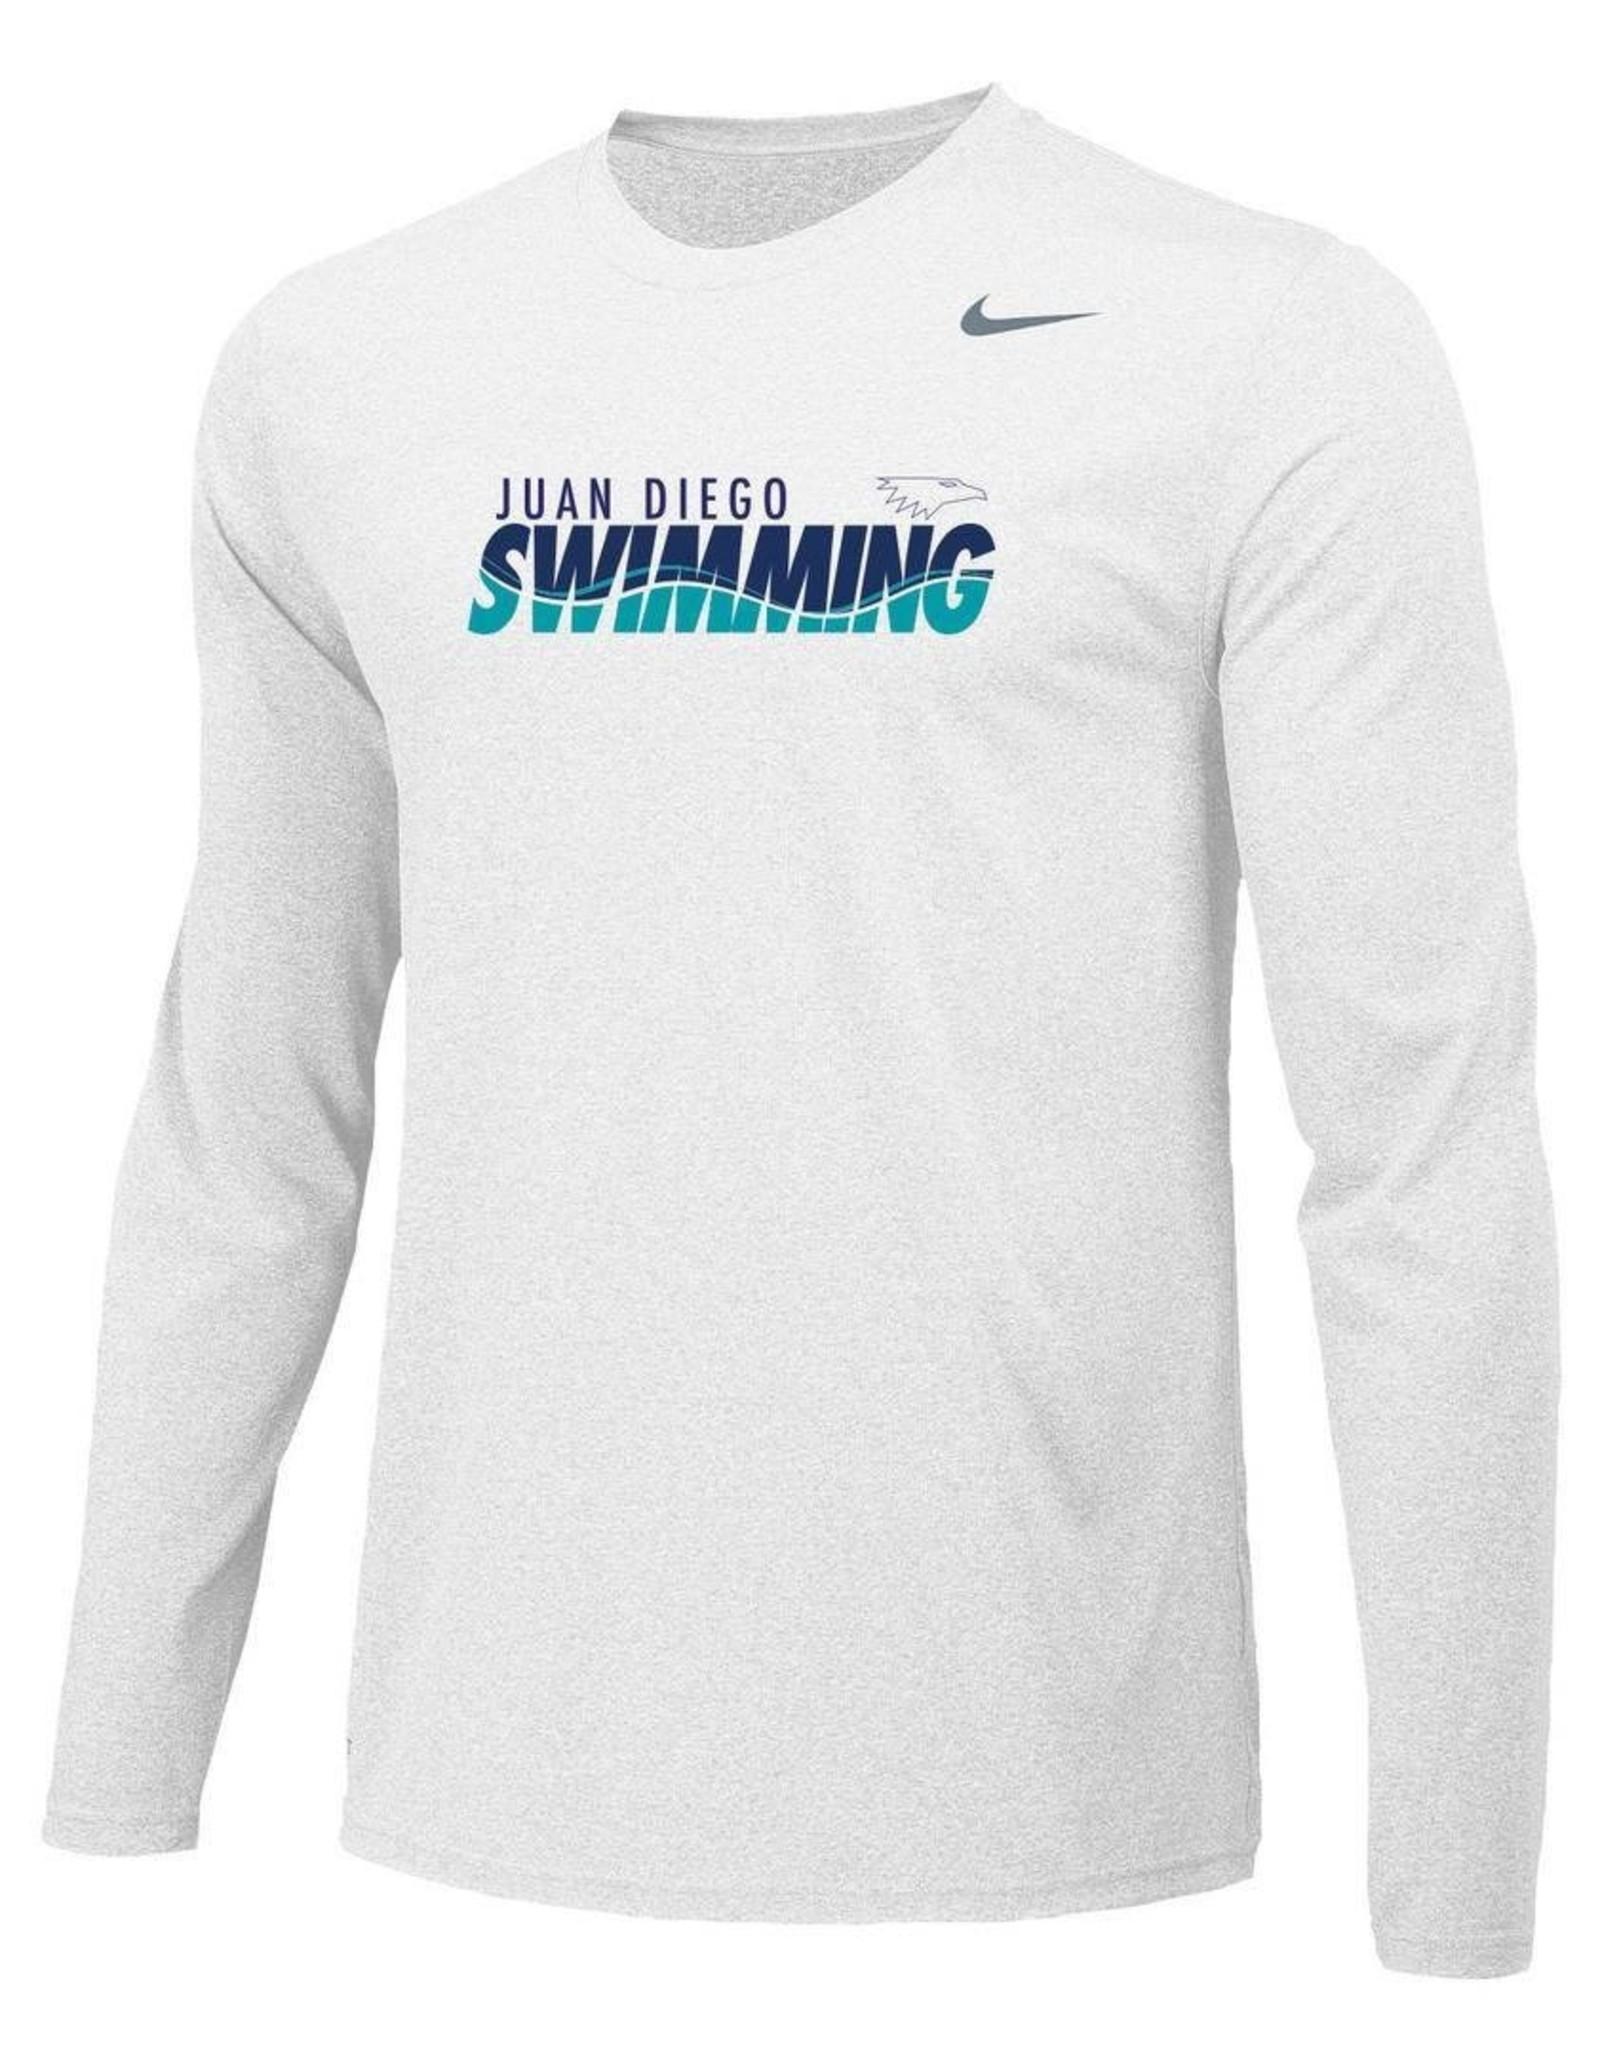 NON-UNIFORM JD Swim Team Long Sleeve Nike Tee   27980